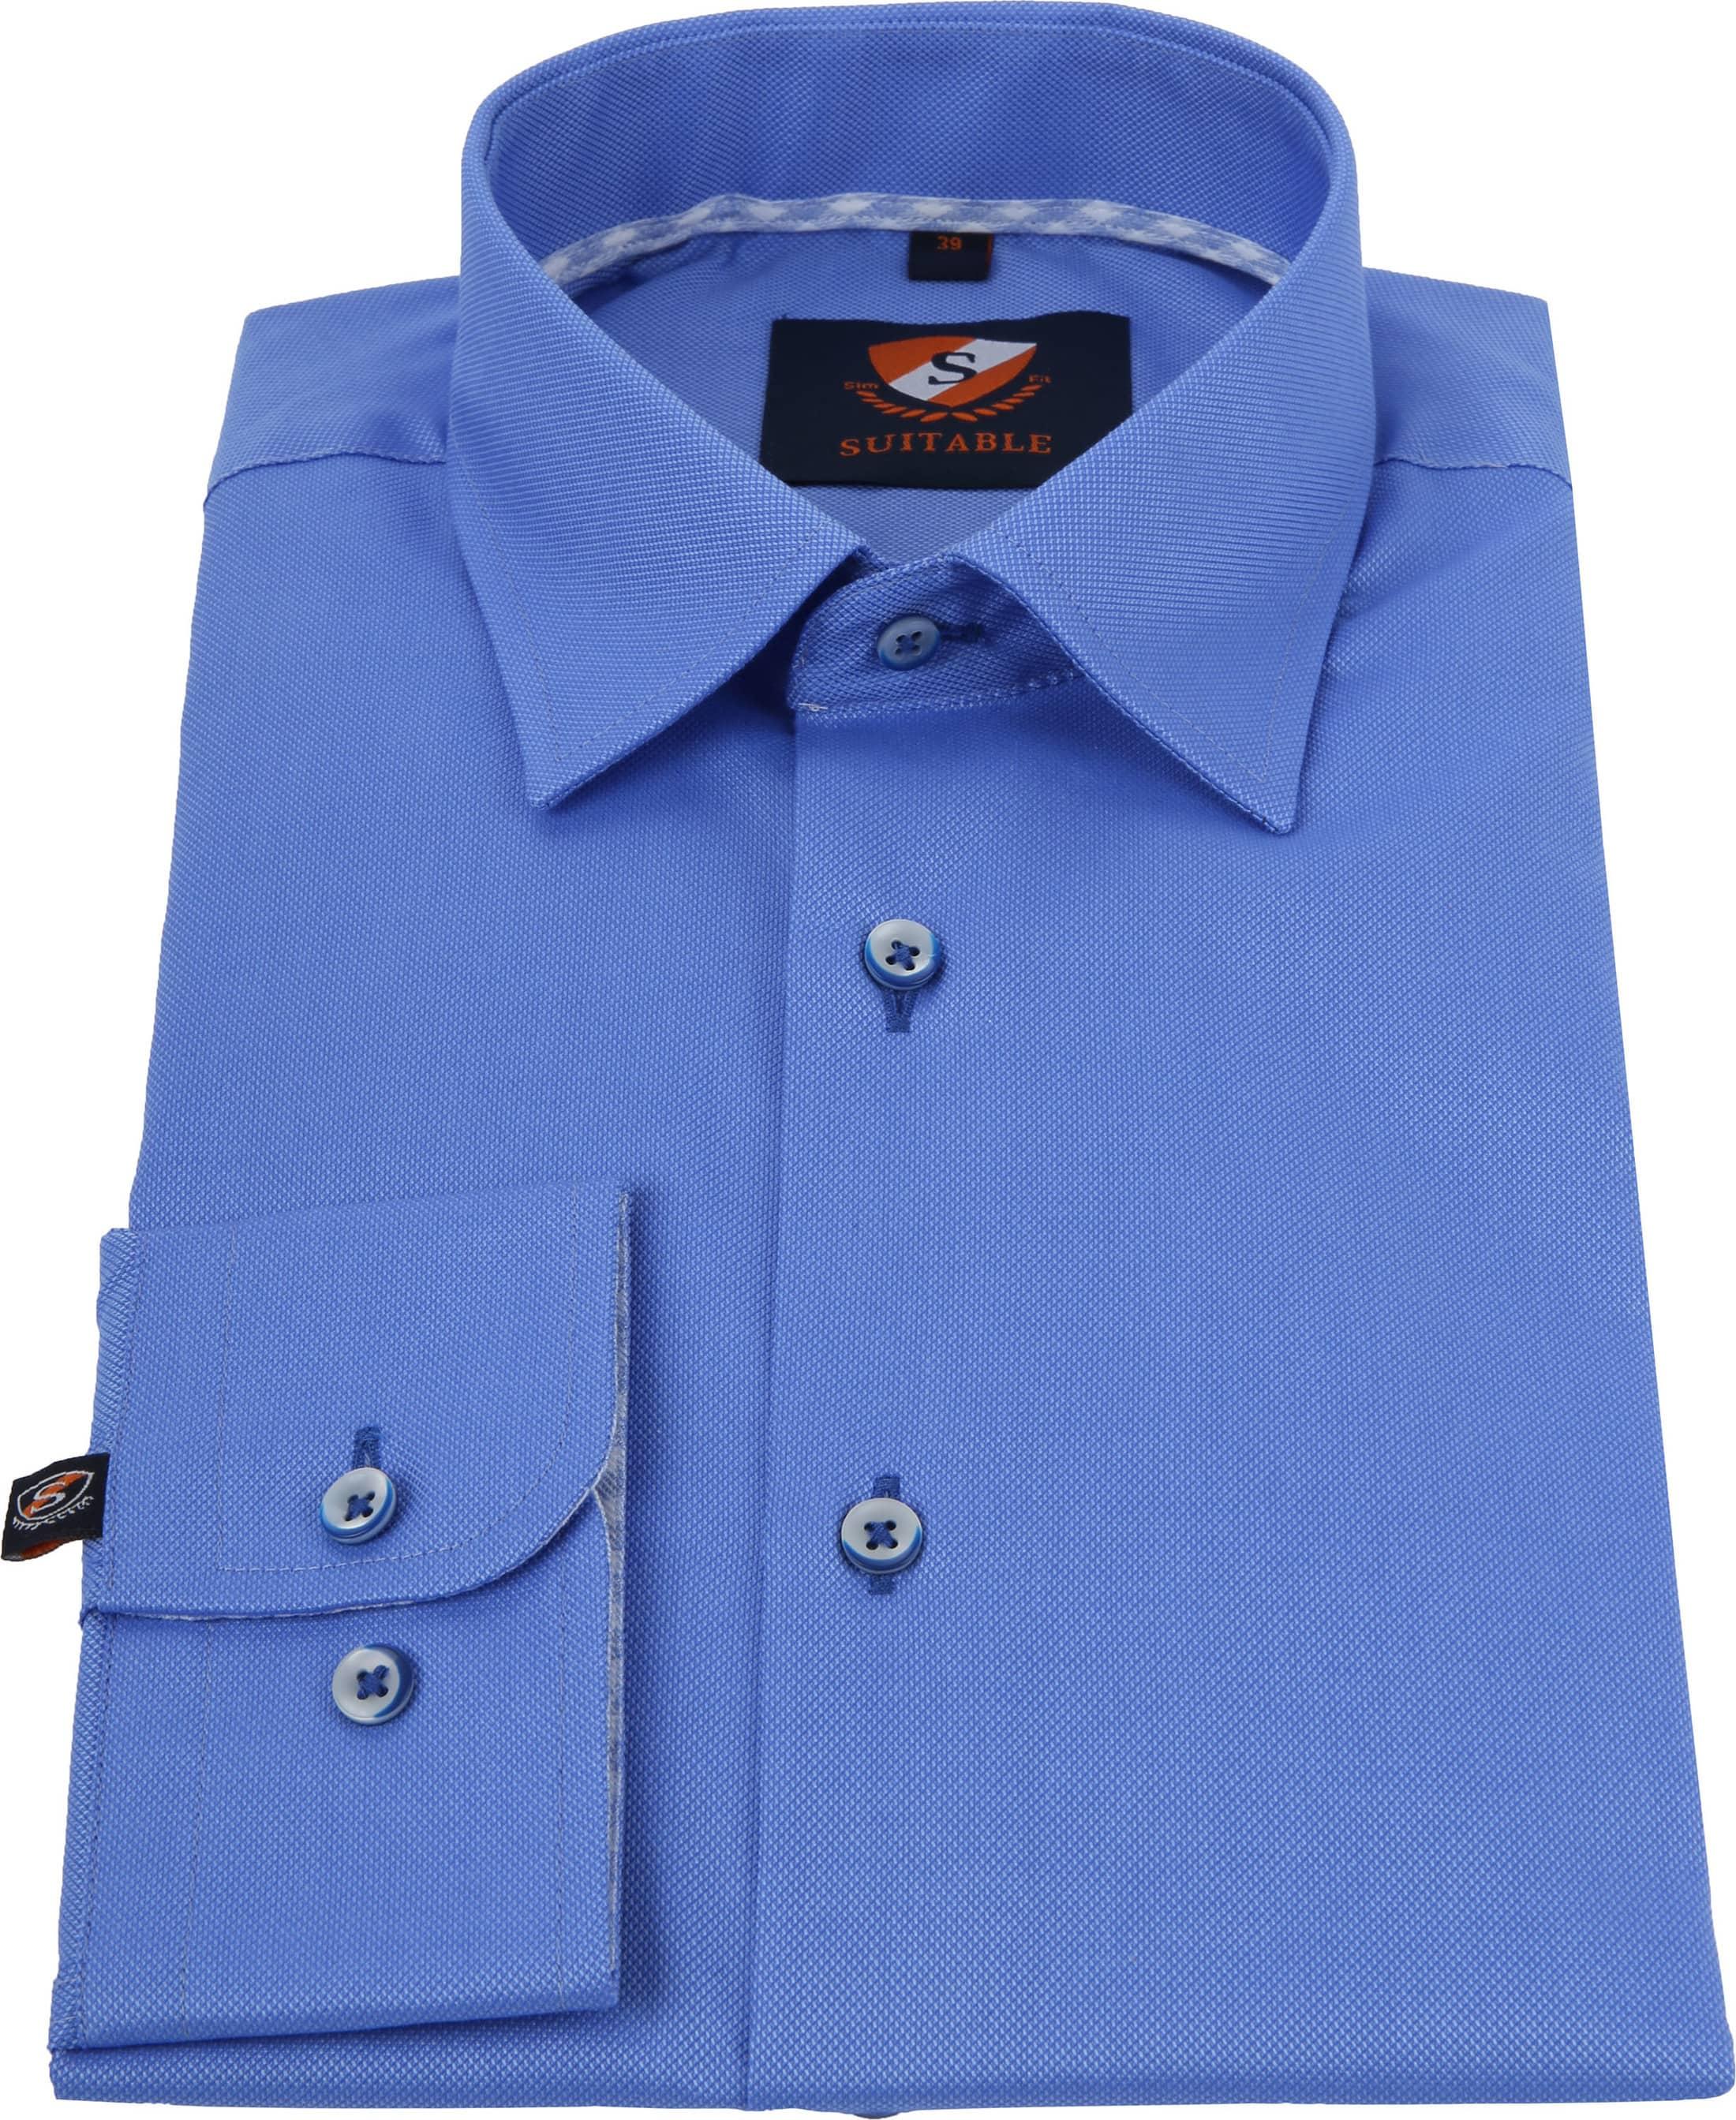 Suitable Overhemd Kobalt HBD foto 2